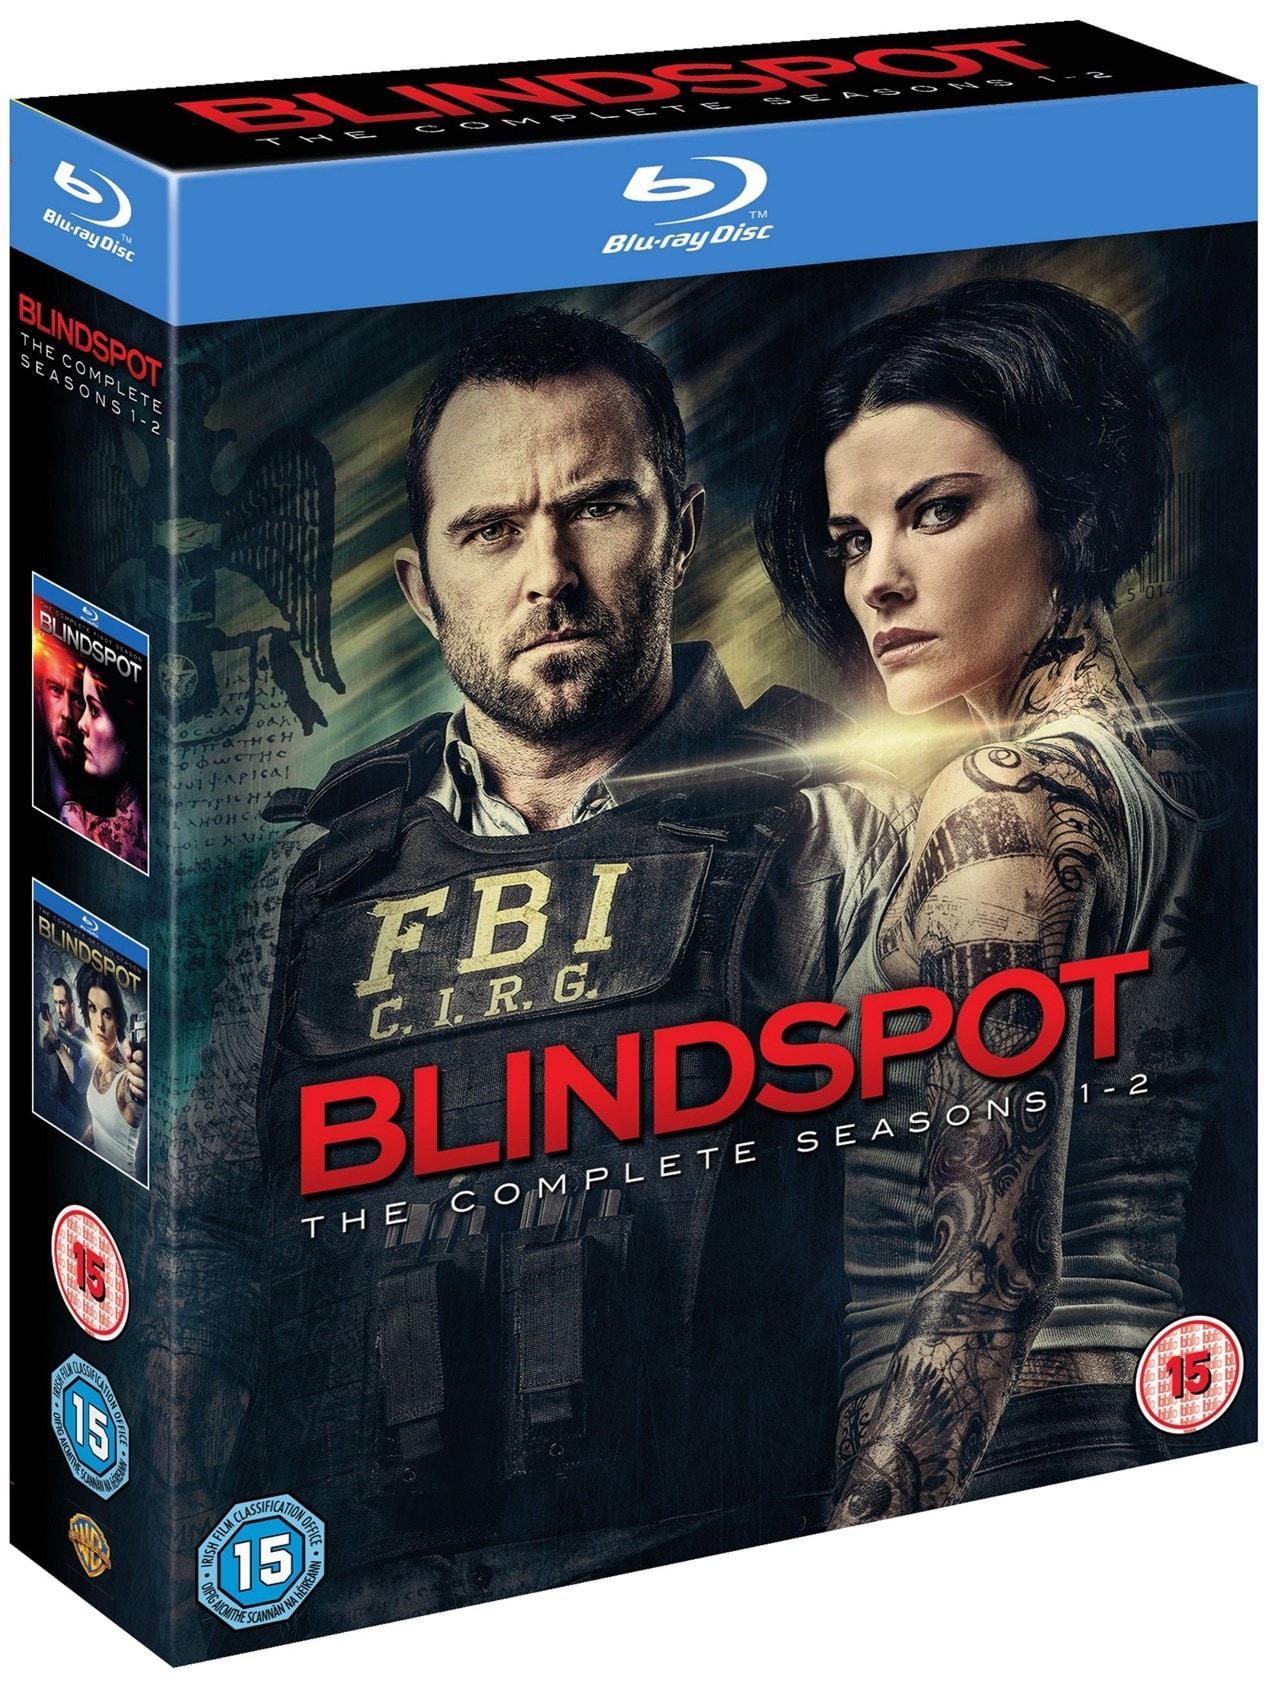 Blindspot: The Complete Seasons 1-2 - 2